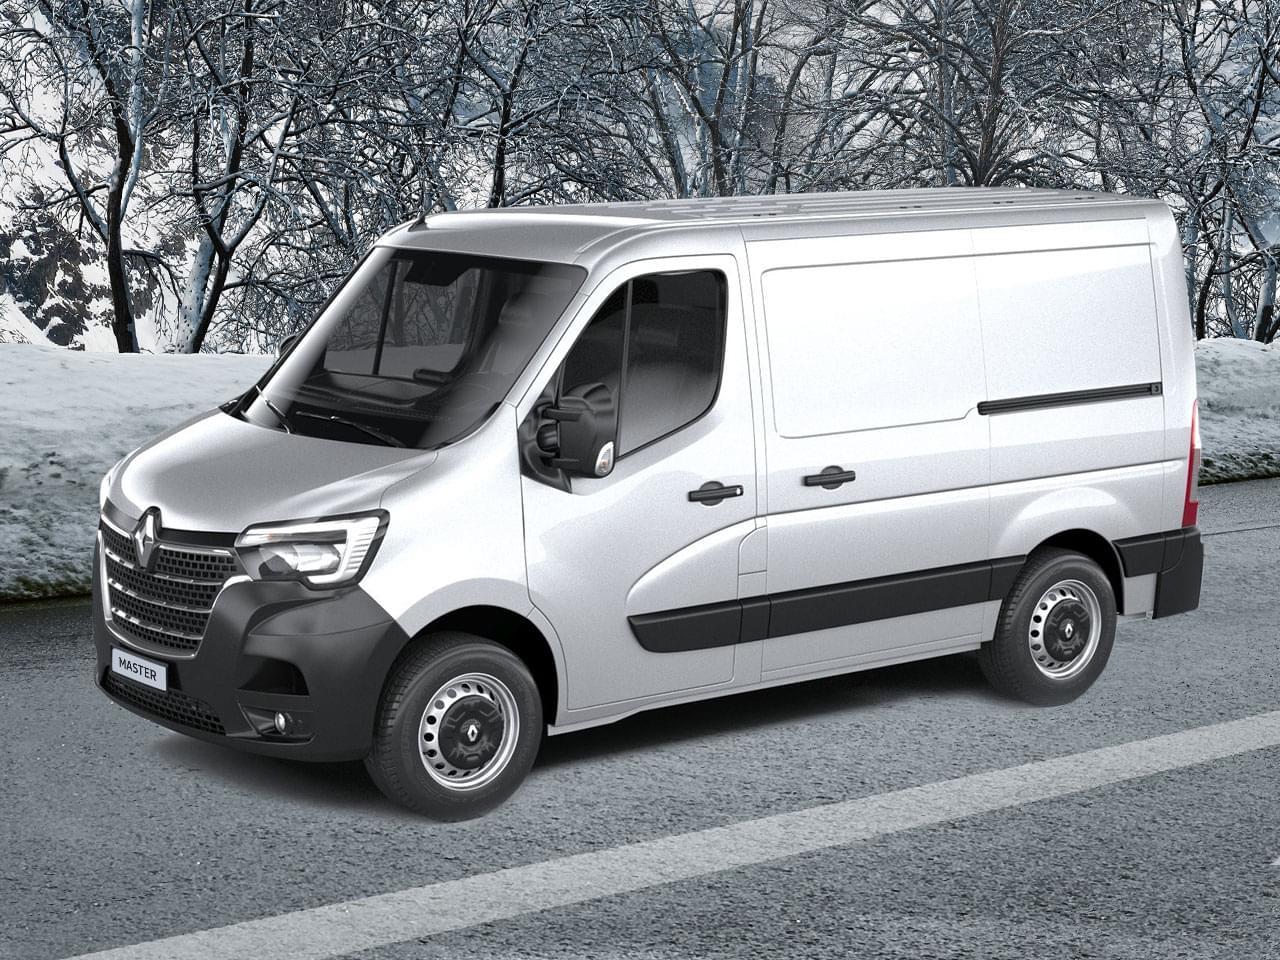 Renault Master DoKa 7-Sitzer L3H2 3,5t dCi 180 EURO6d-Temp